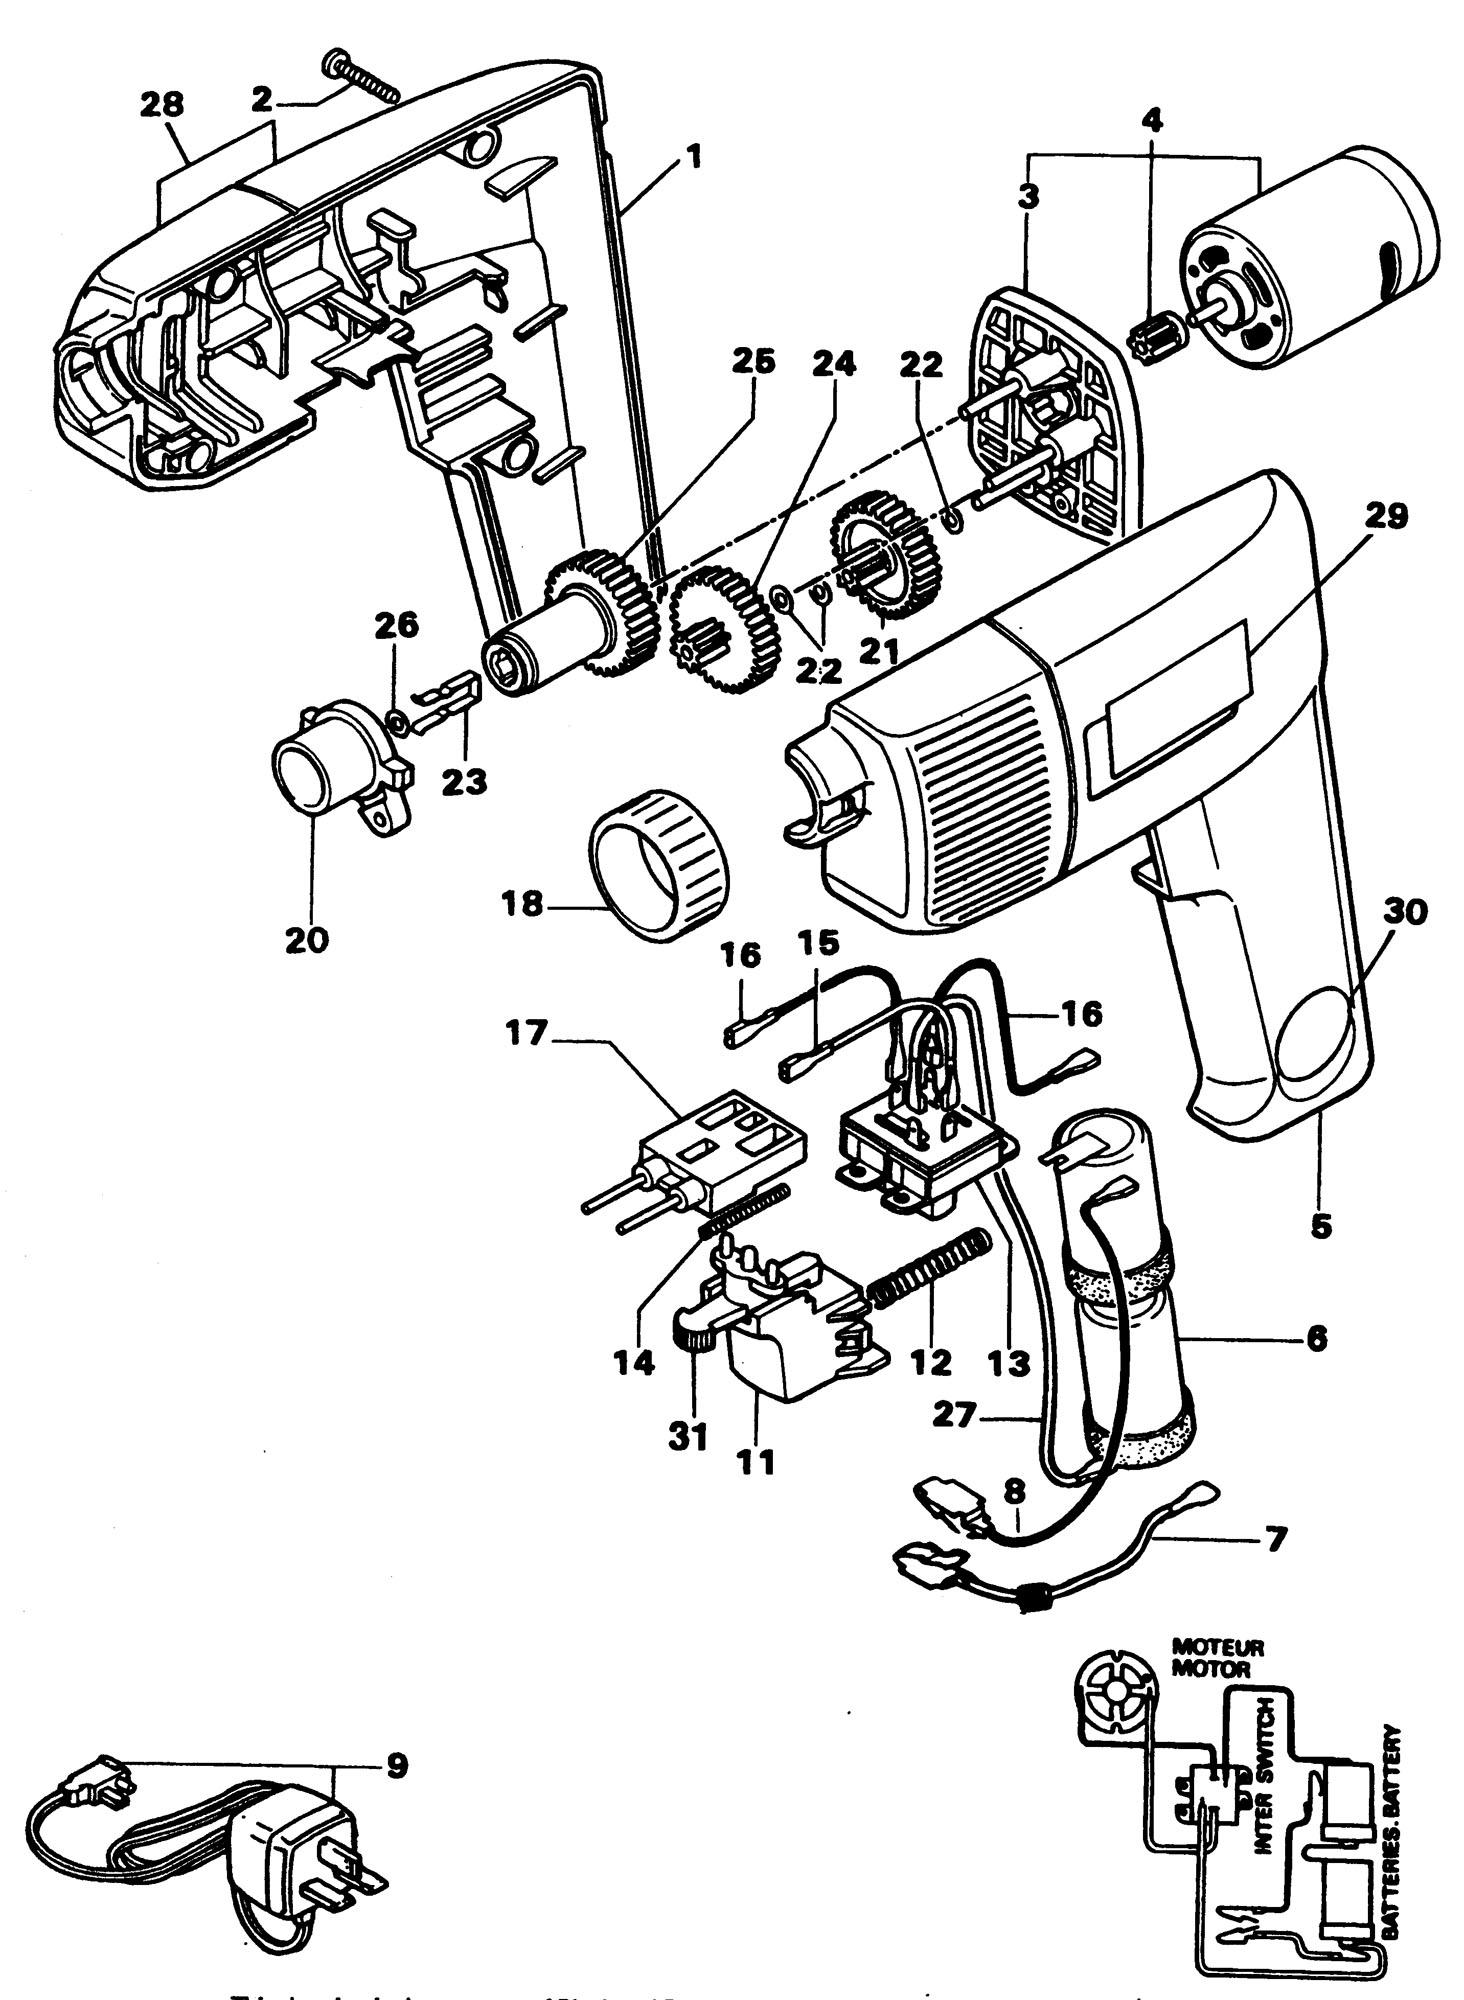 Spares For Black Amp Decker Bd430 Screwdriver Type 1 Spare